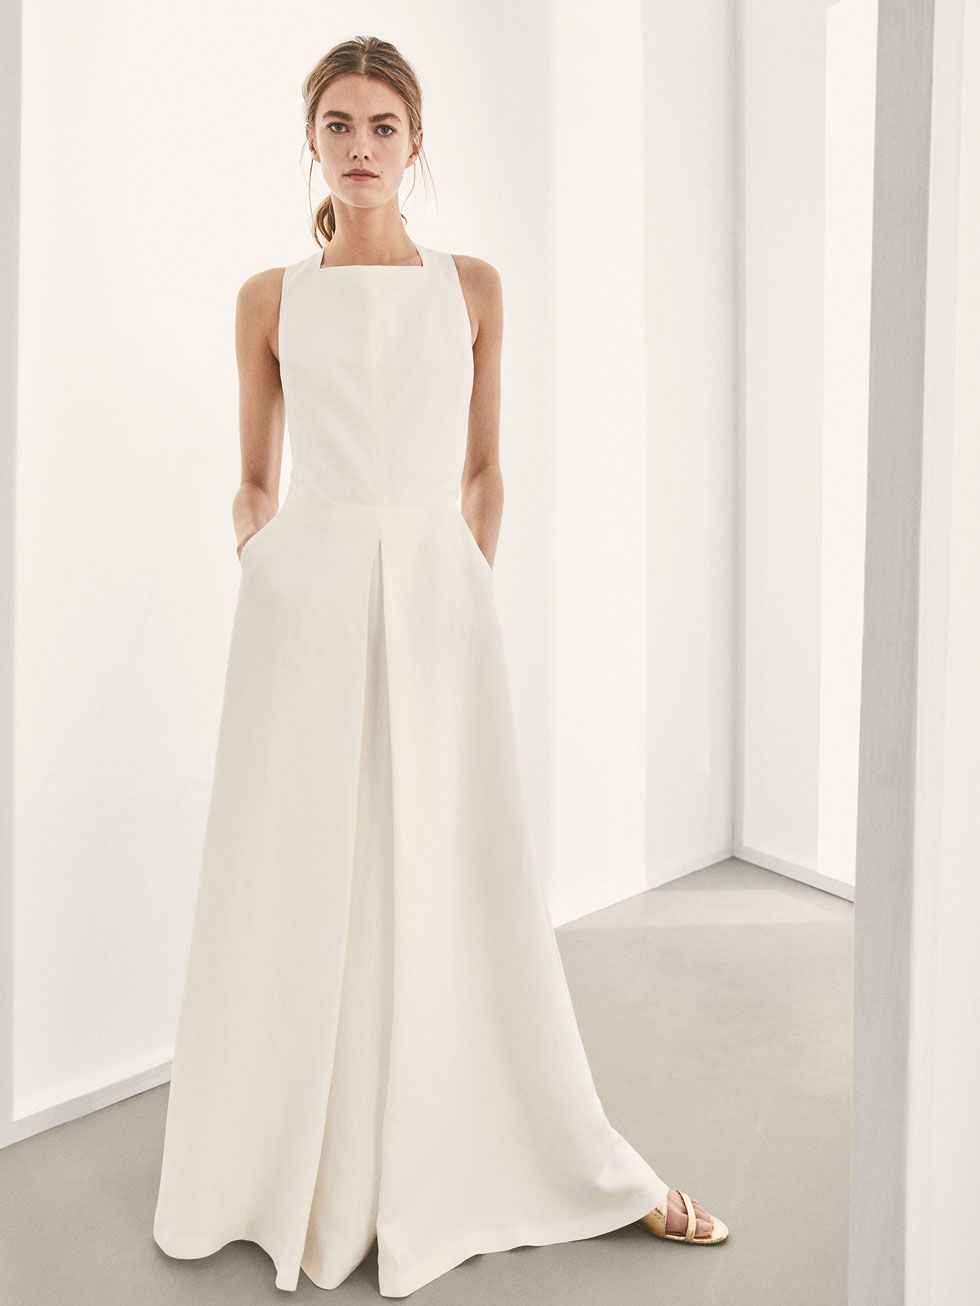 b0e81ad0c0 LINEN DRESS WITH CRISS-CROSS BACK - Women - Massimo Dutti